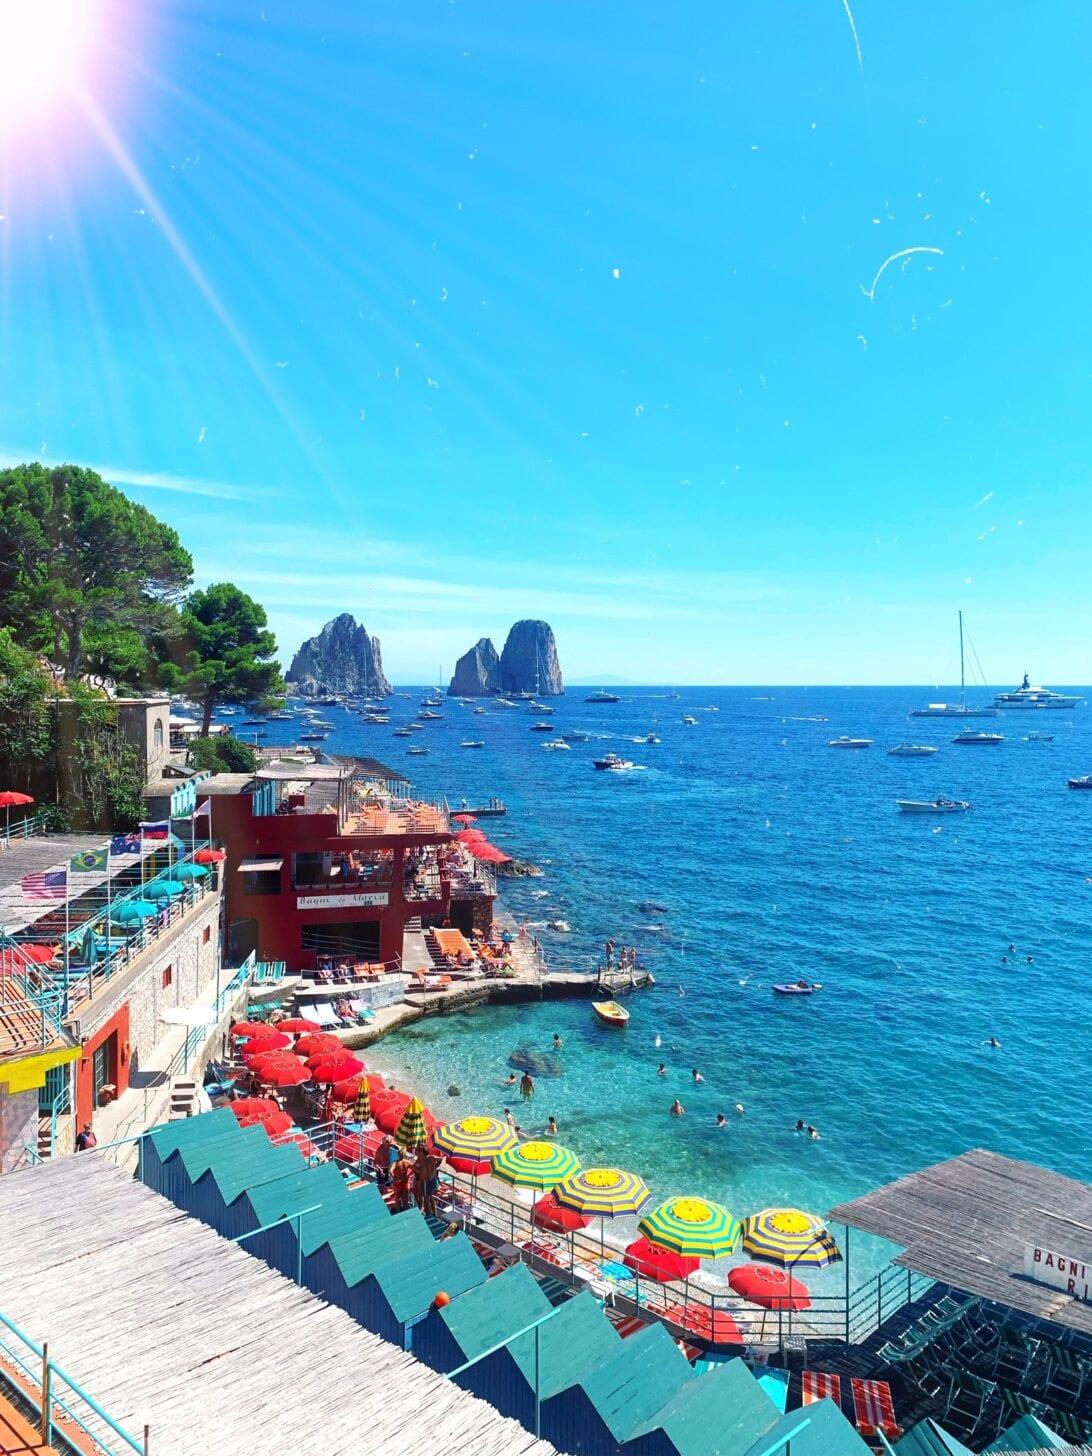 Marina Piccola restaurants, Capri bay